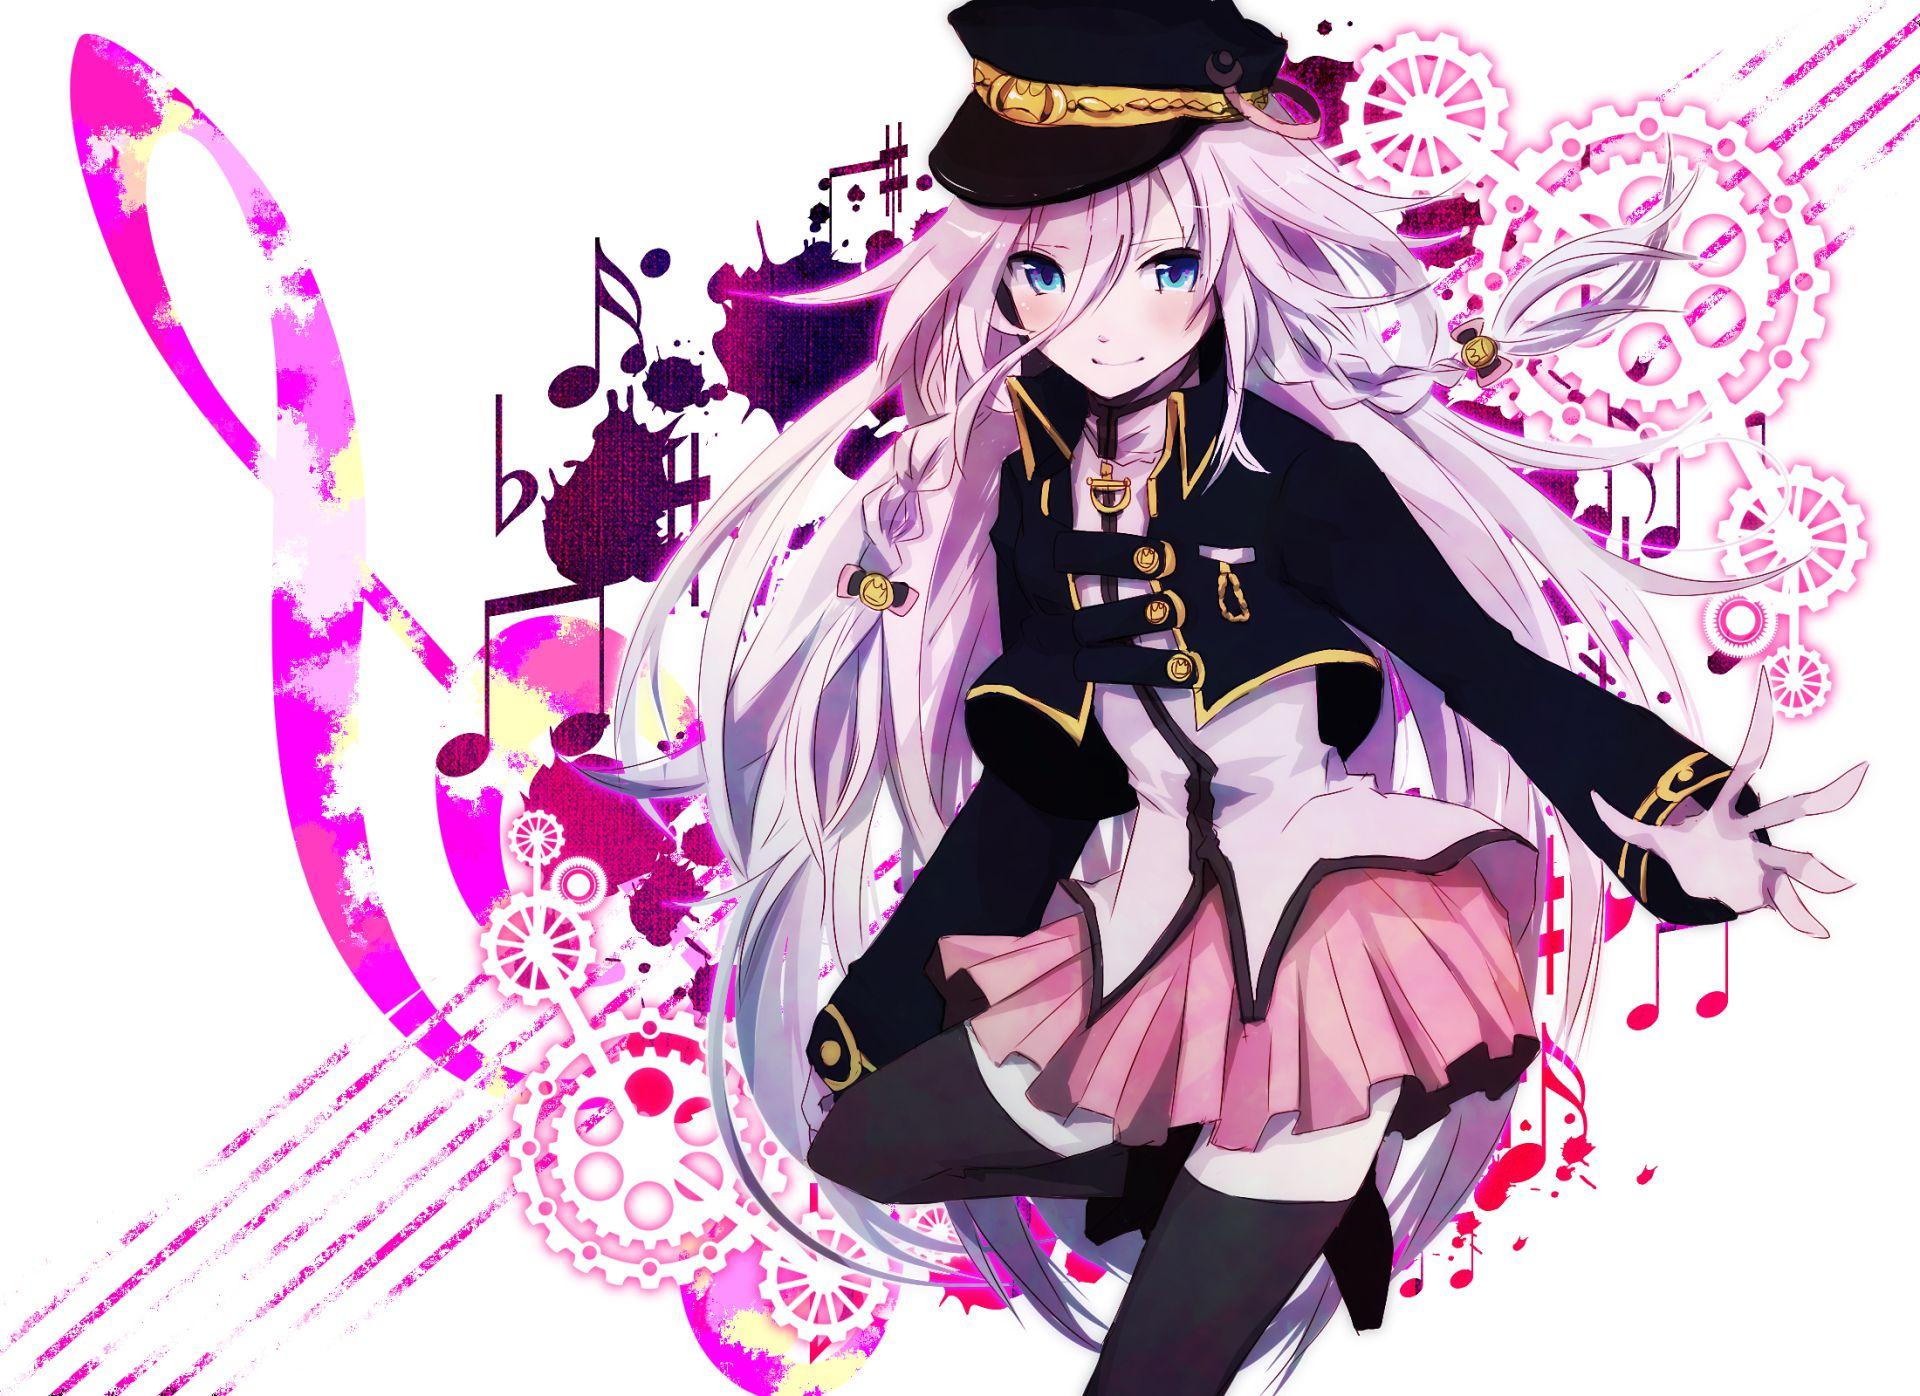 Anime Vocaloid Ia Vocaloid Wallpaper Vocaloid O Manga